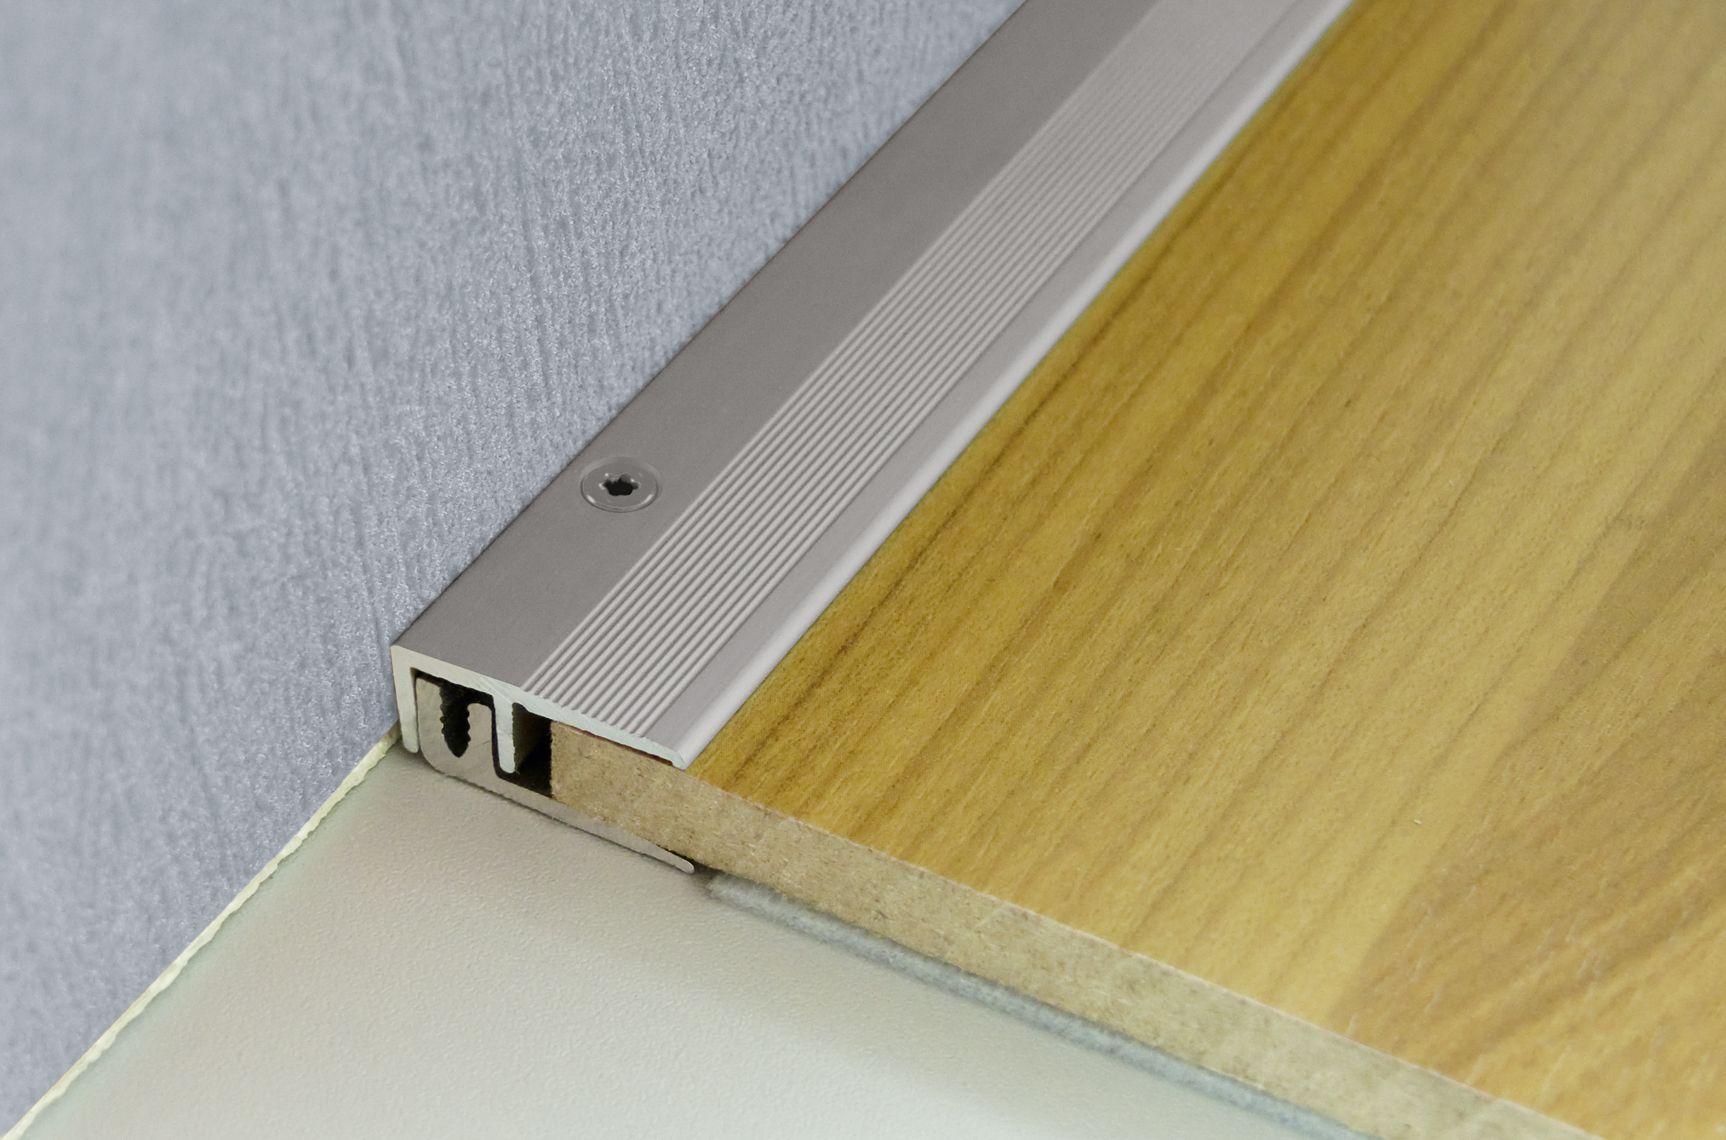 fu bodenprofilsysteme f r parkett laminat lvt designbel ge und teppich ais. Black Bedroom Furniture Sets. Home Design Ideas